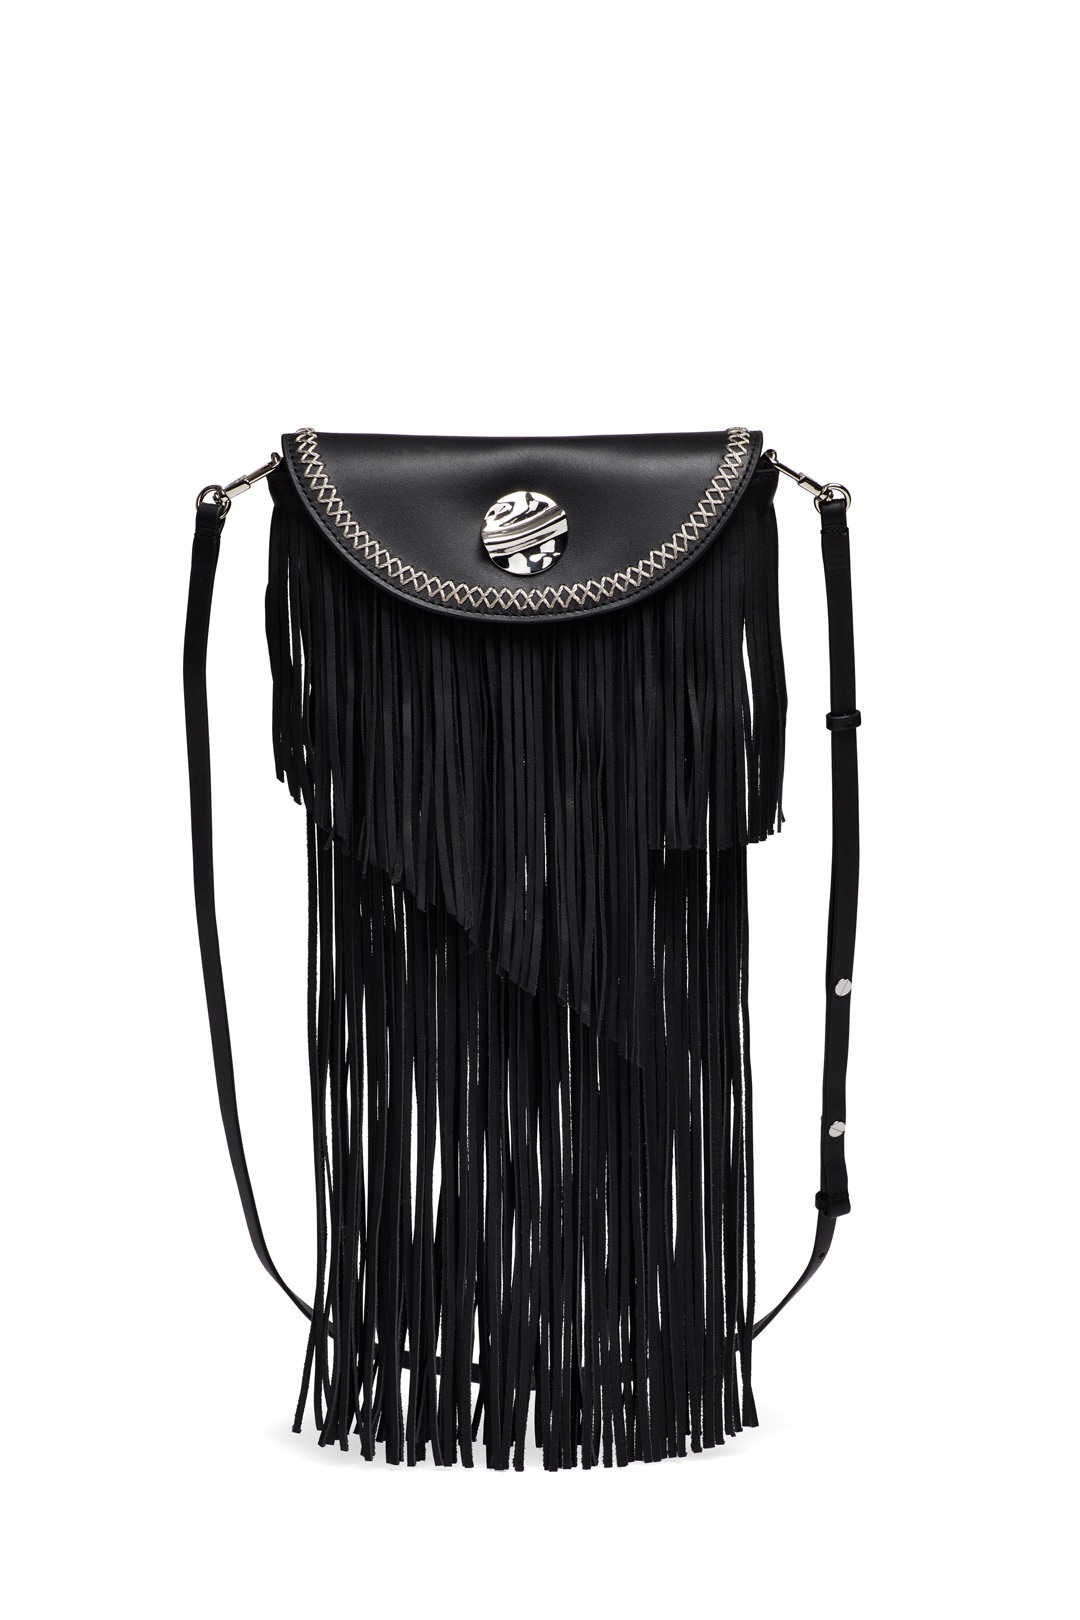 3.1 Phillip Lim Accessories Hudson Fringe Bag - I know Coachella is over but still…